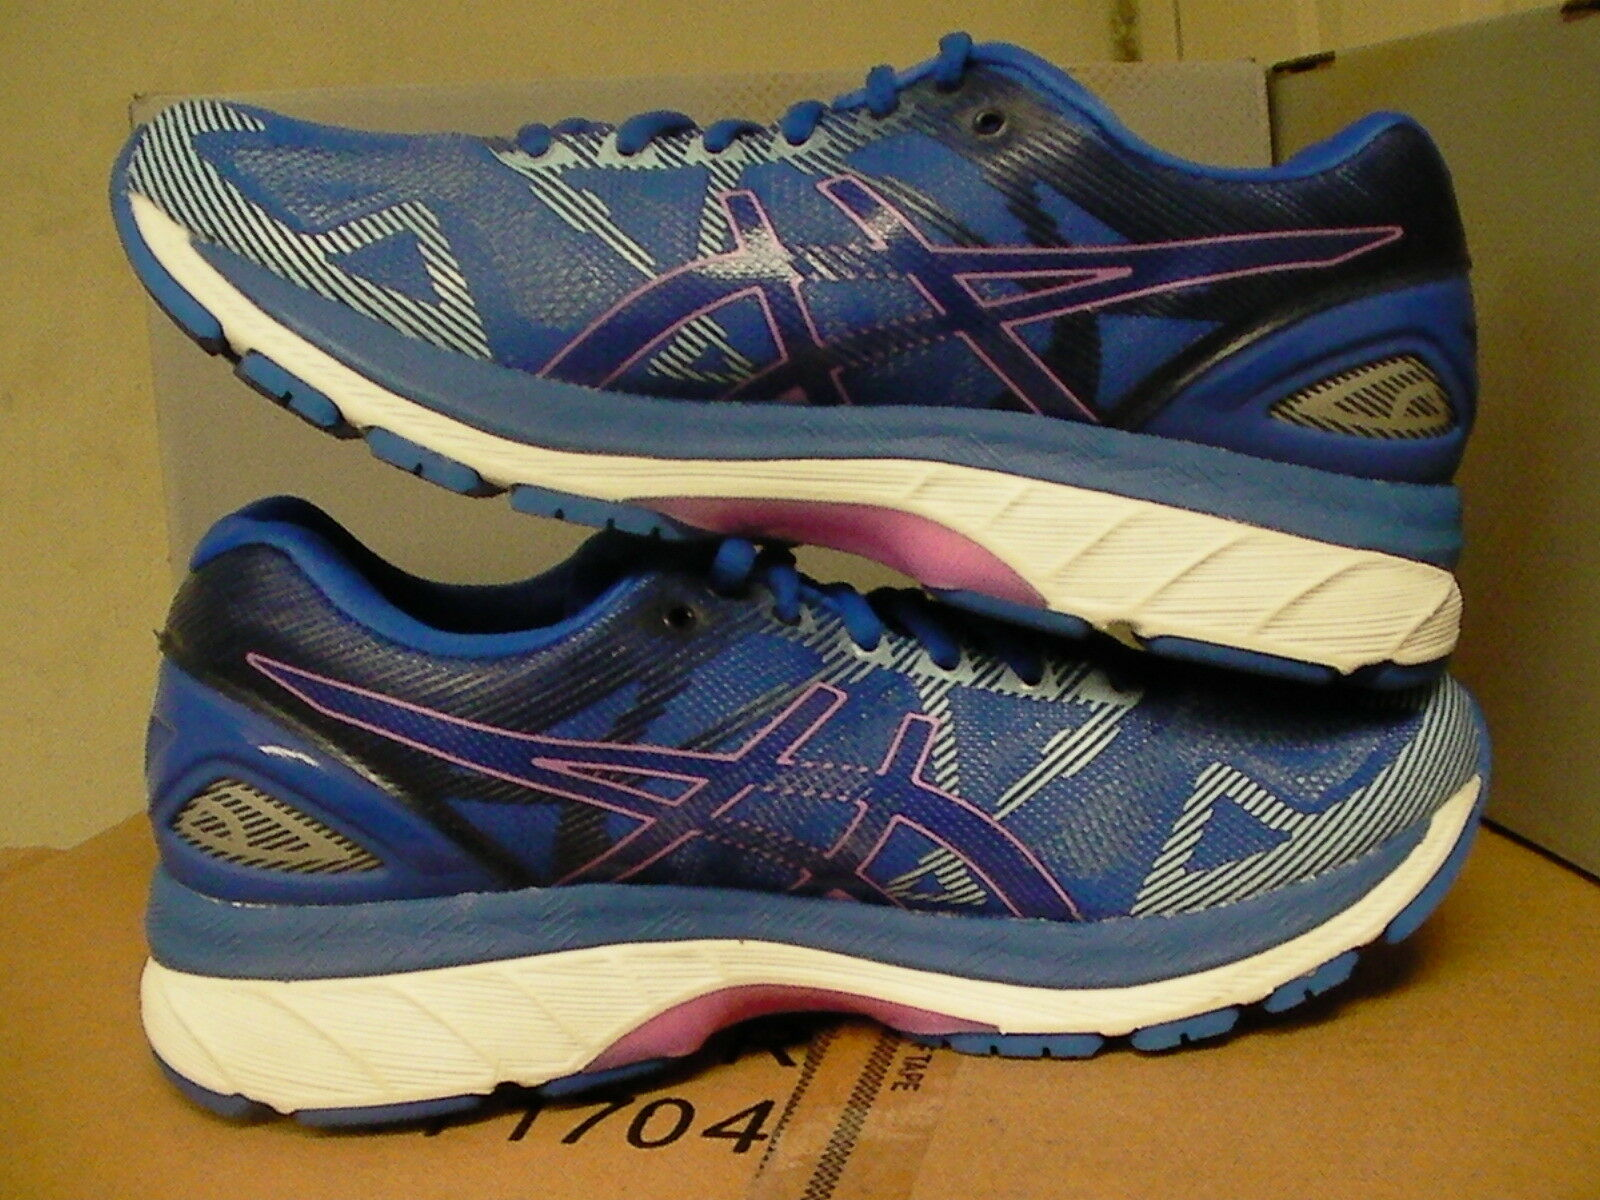 Asics women's gel nimbus 19 19 19 bluee purple purple running shoes size 8 us 58c9c4